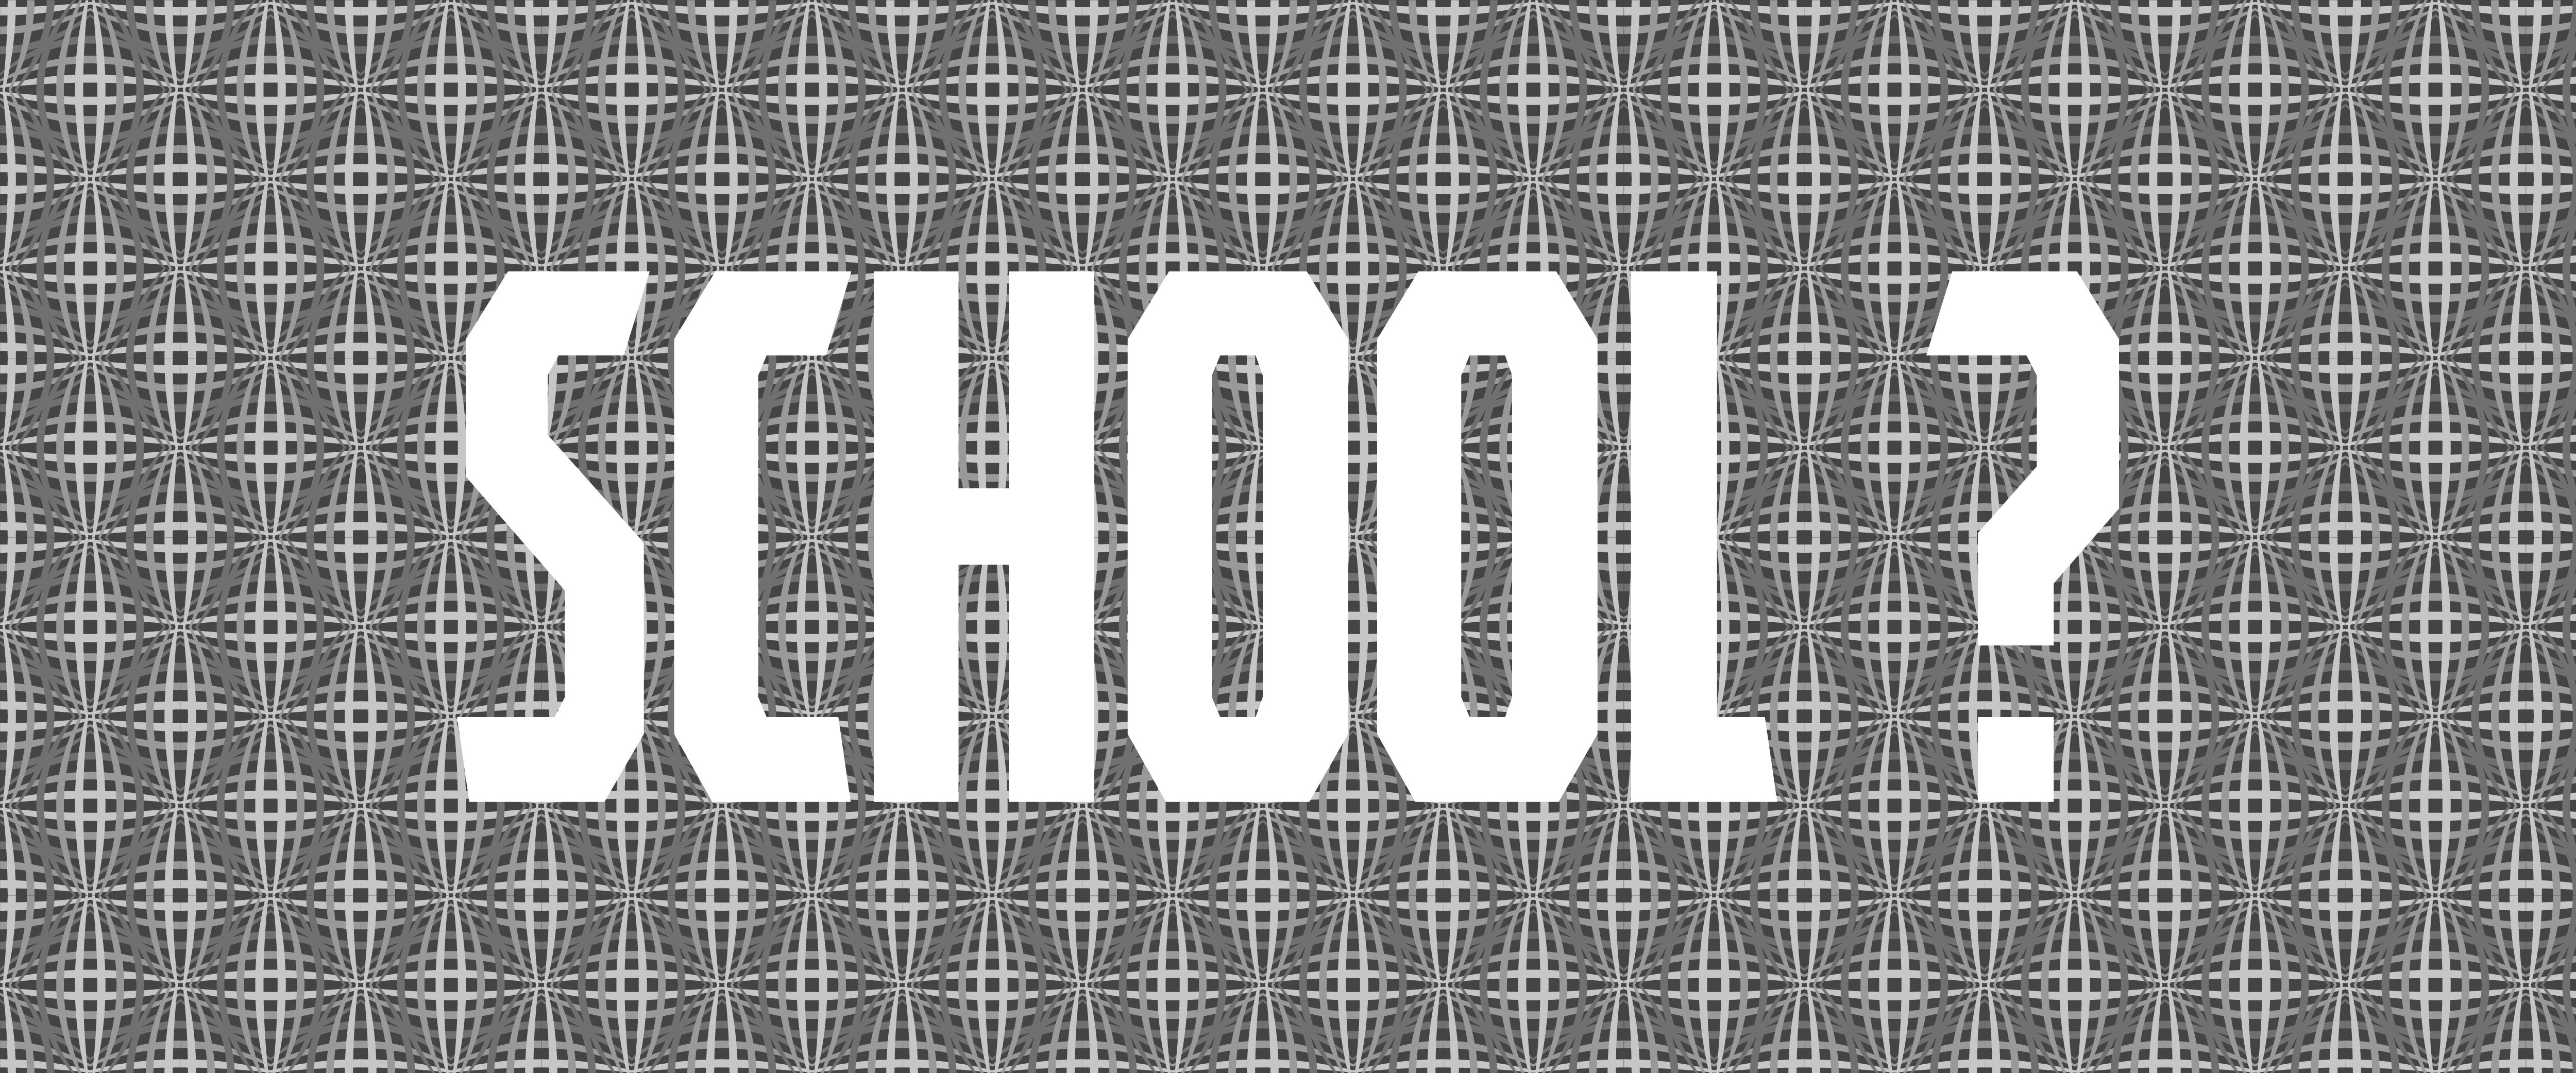 a School?